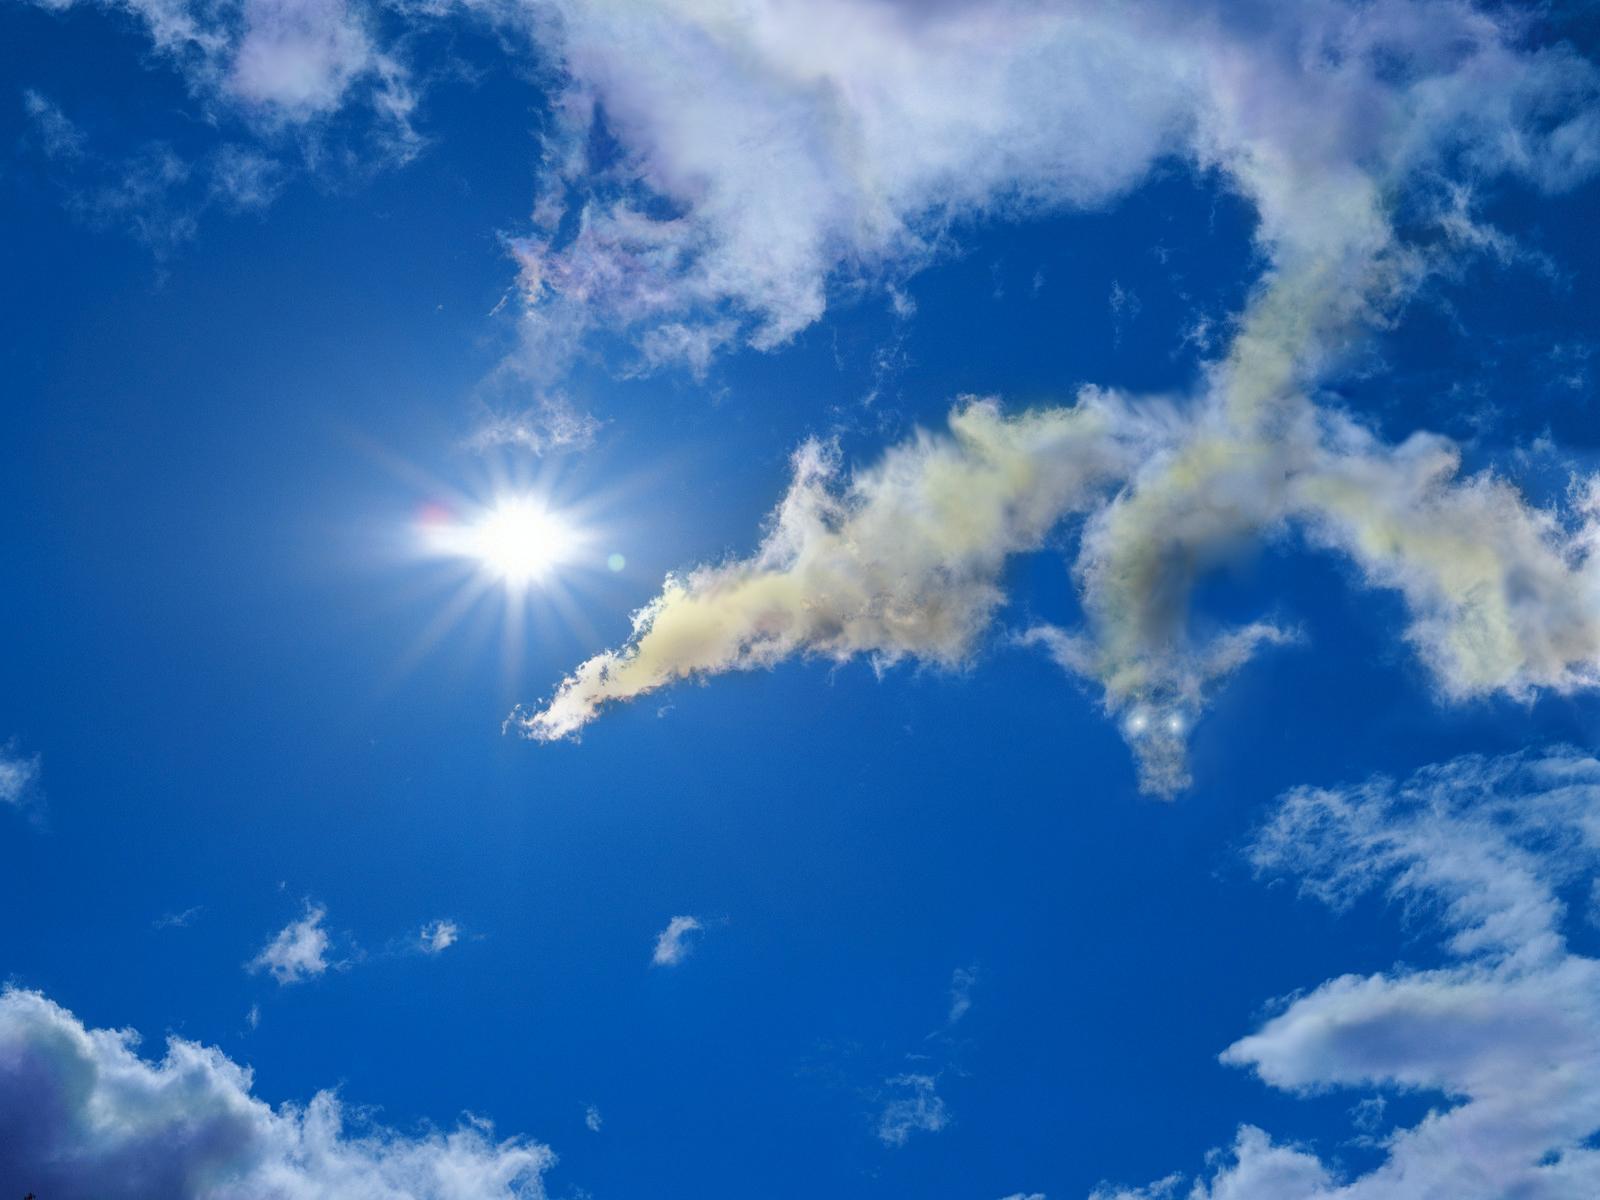 cloud_dragon 2.jpg